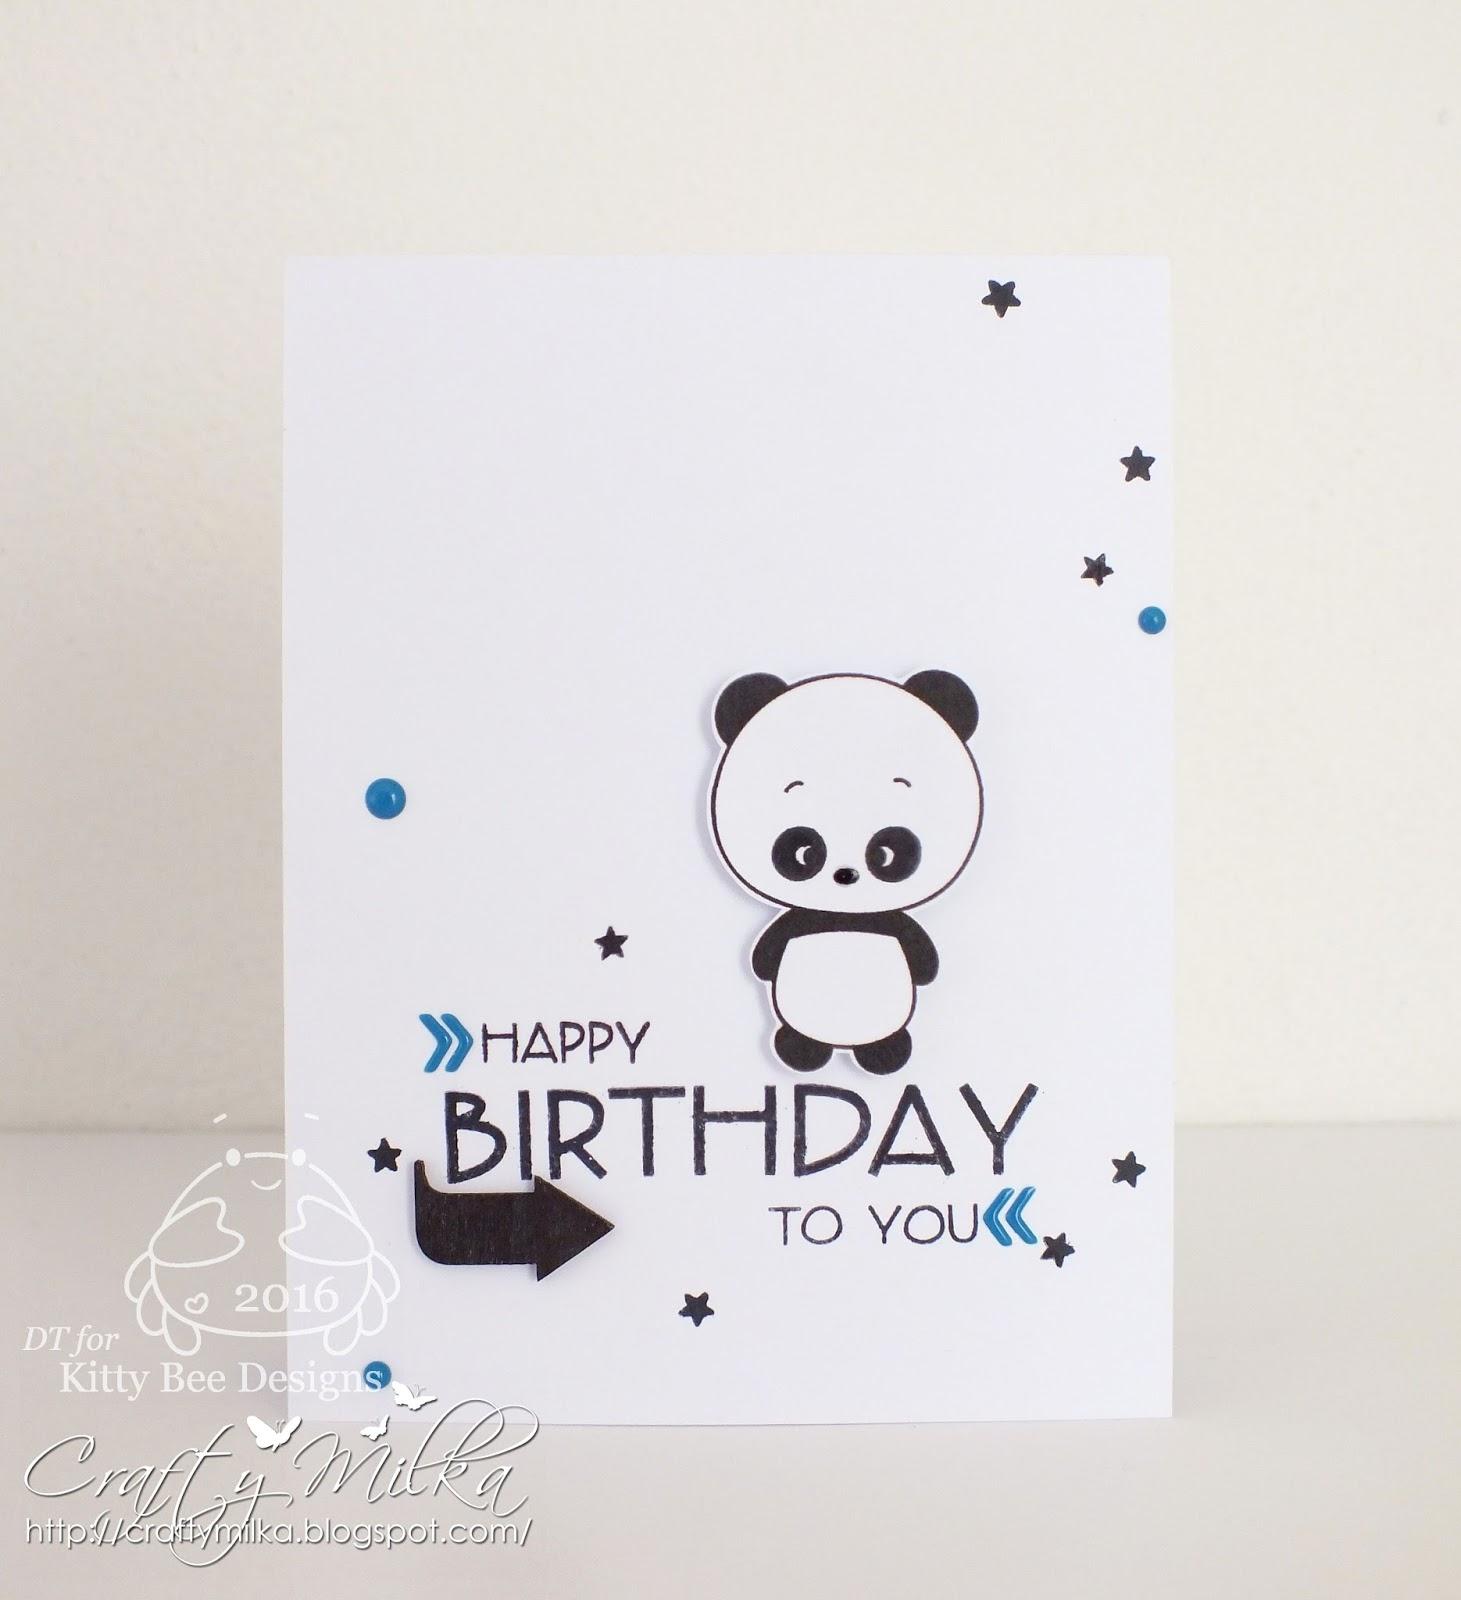 Crafty milka happy birthday panda card kitty bee designs spotlight happy birthday panda card i used super cute panda love from 2013 january panda releases love all of them o bookmarktalkfo Choice Image